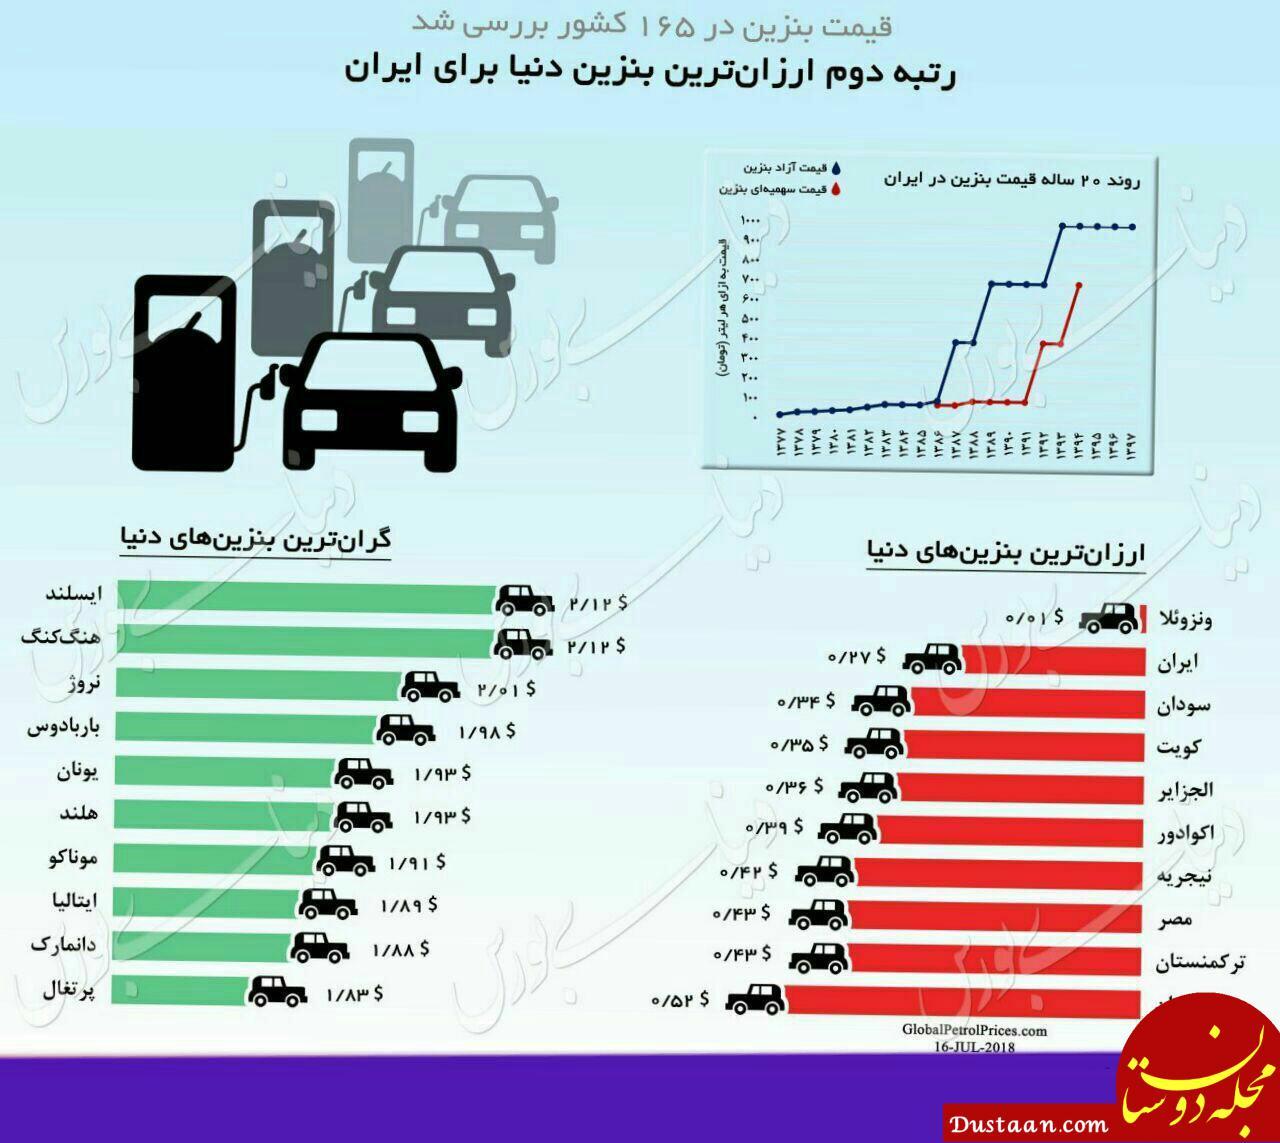 www.dustaan.com گران ترین و ارزان ترین بنزین در کدام کشورهاست؟ +جایگاه ایران